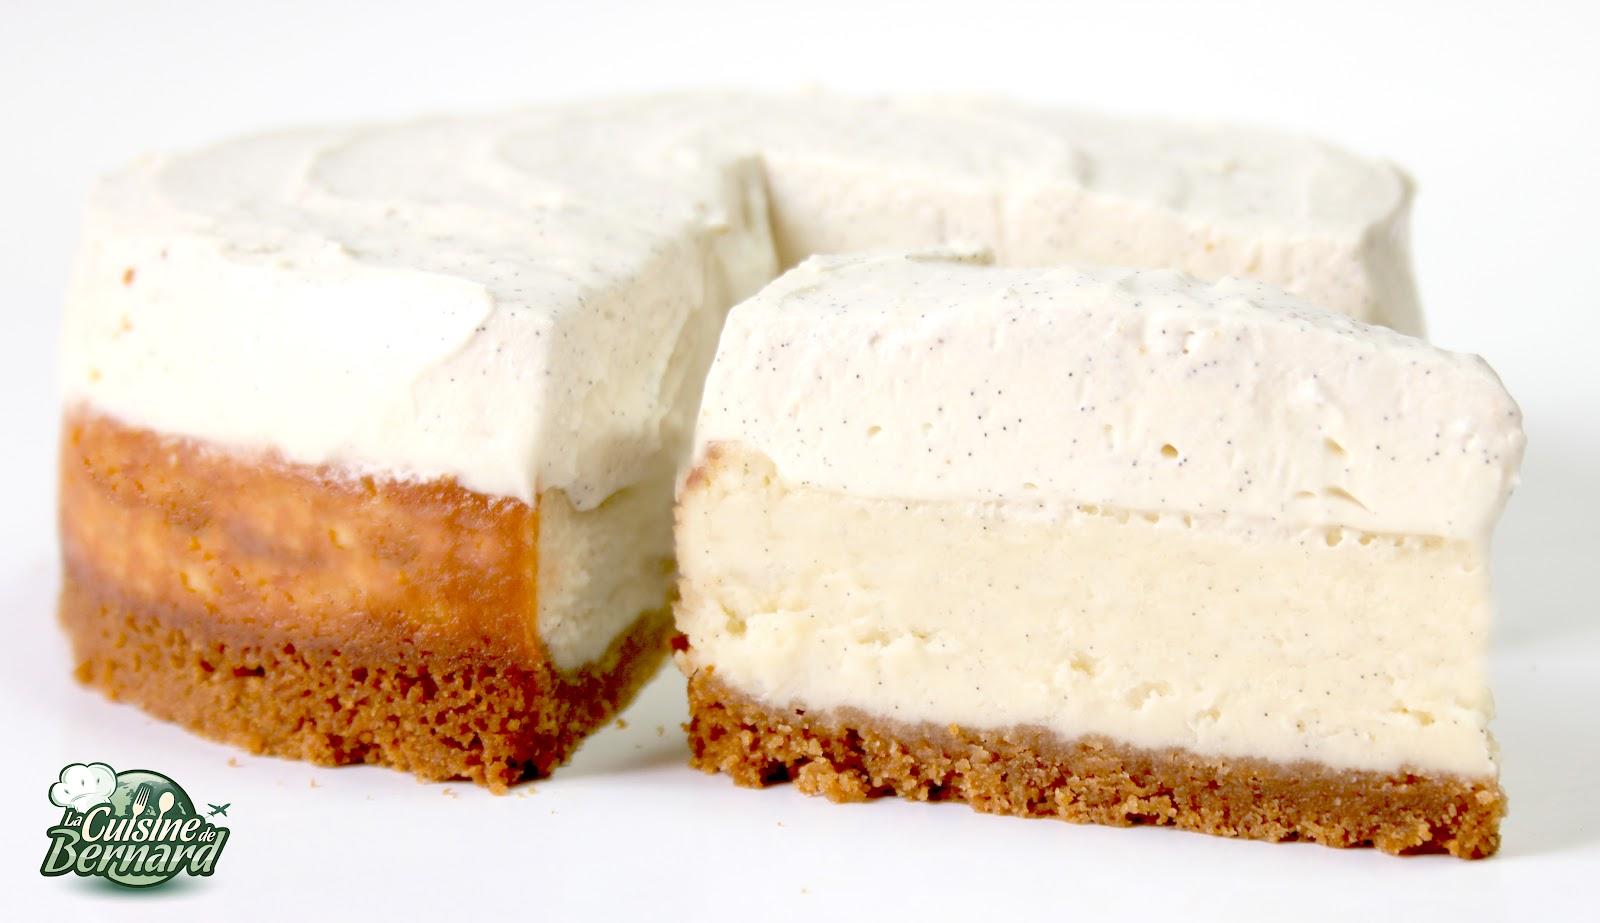 la cuisine de bernard : cheesecake double vanille